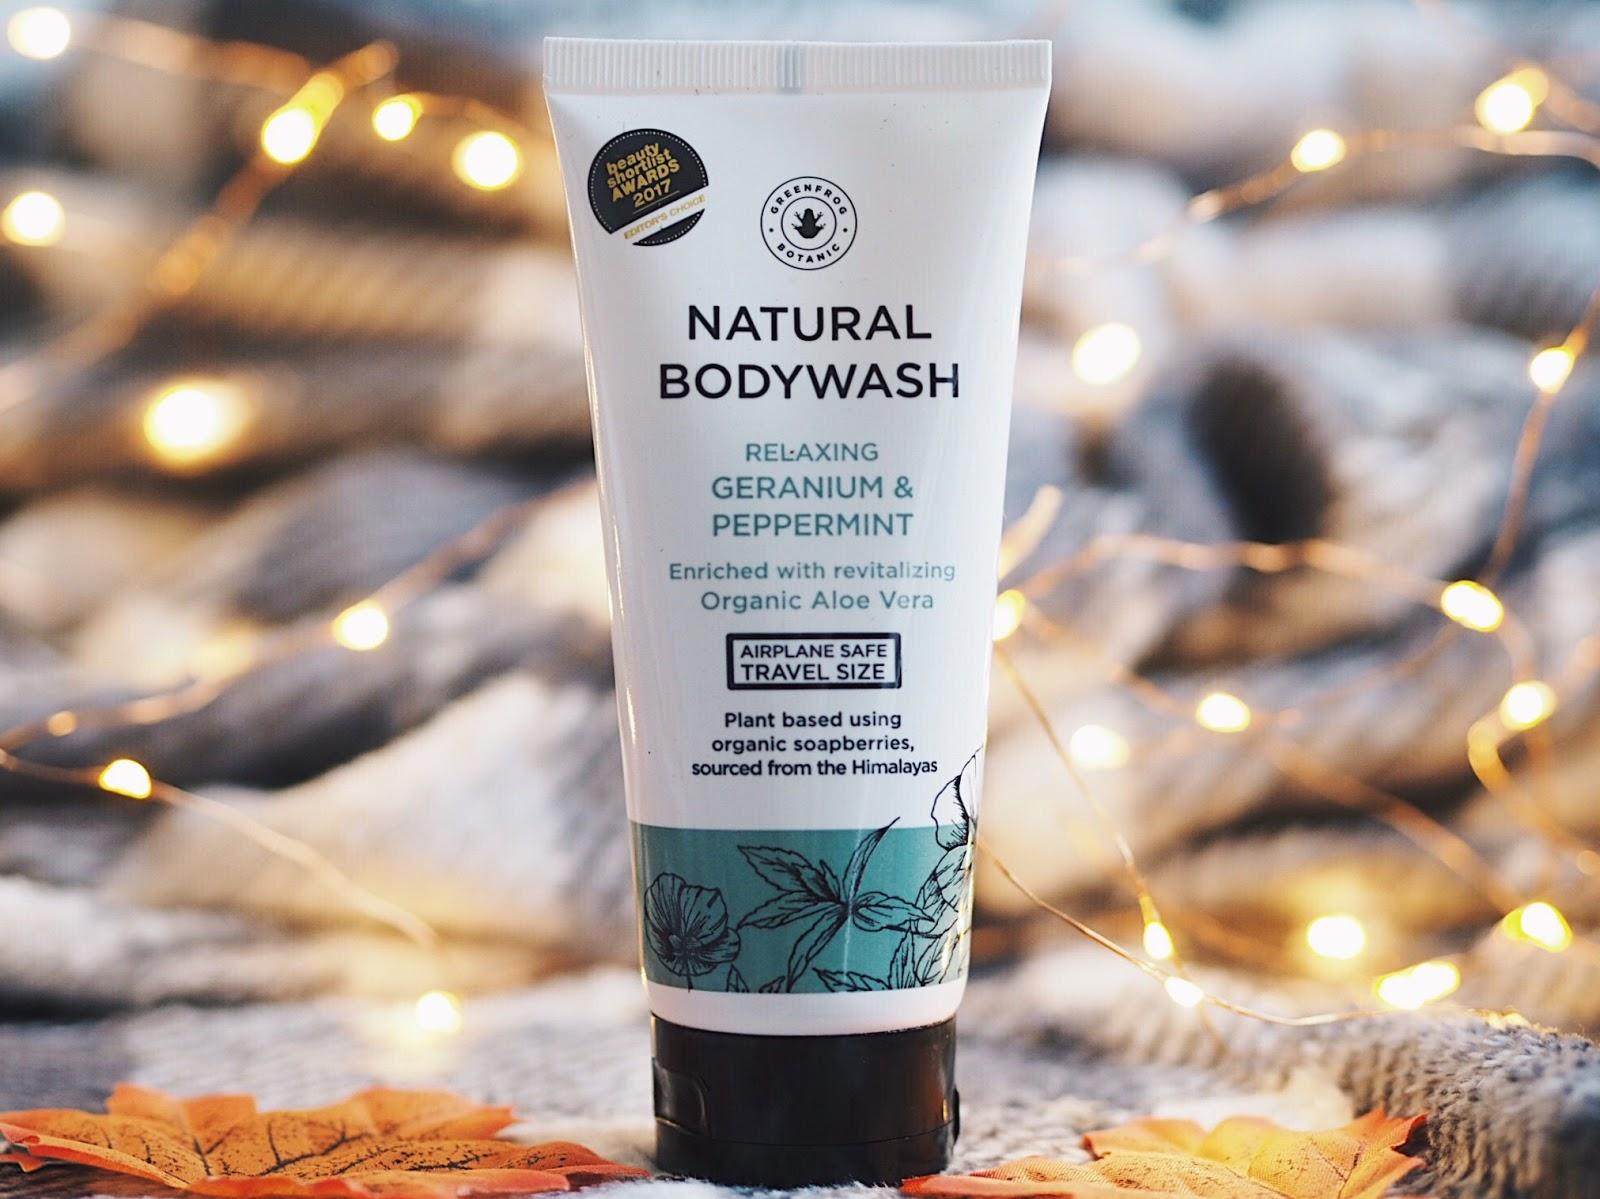 Greenfrog Botanic Natural Bodywash Relaxing Geranium & Peppermint